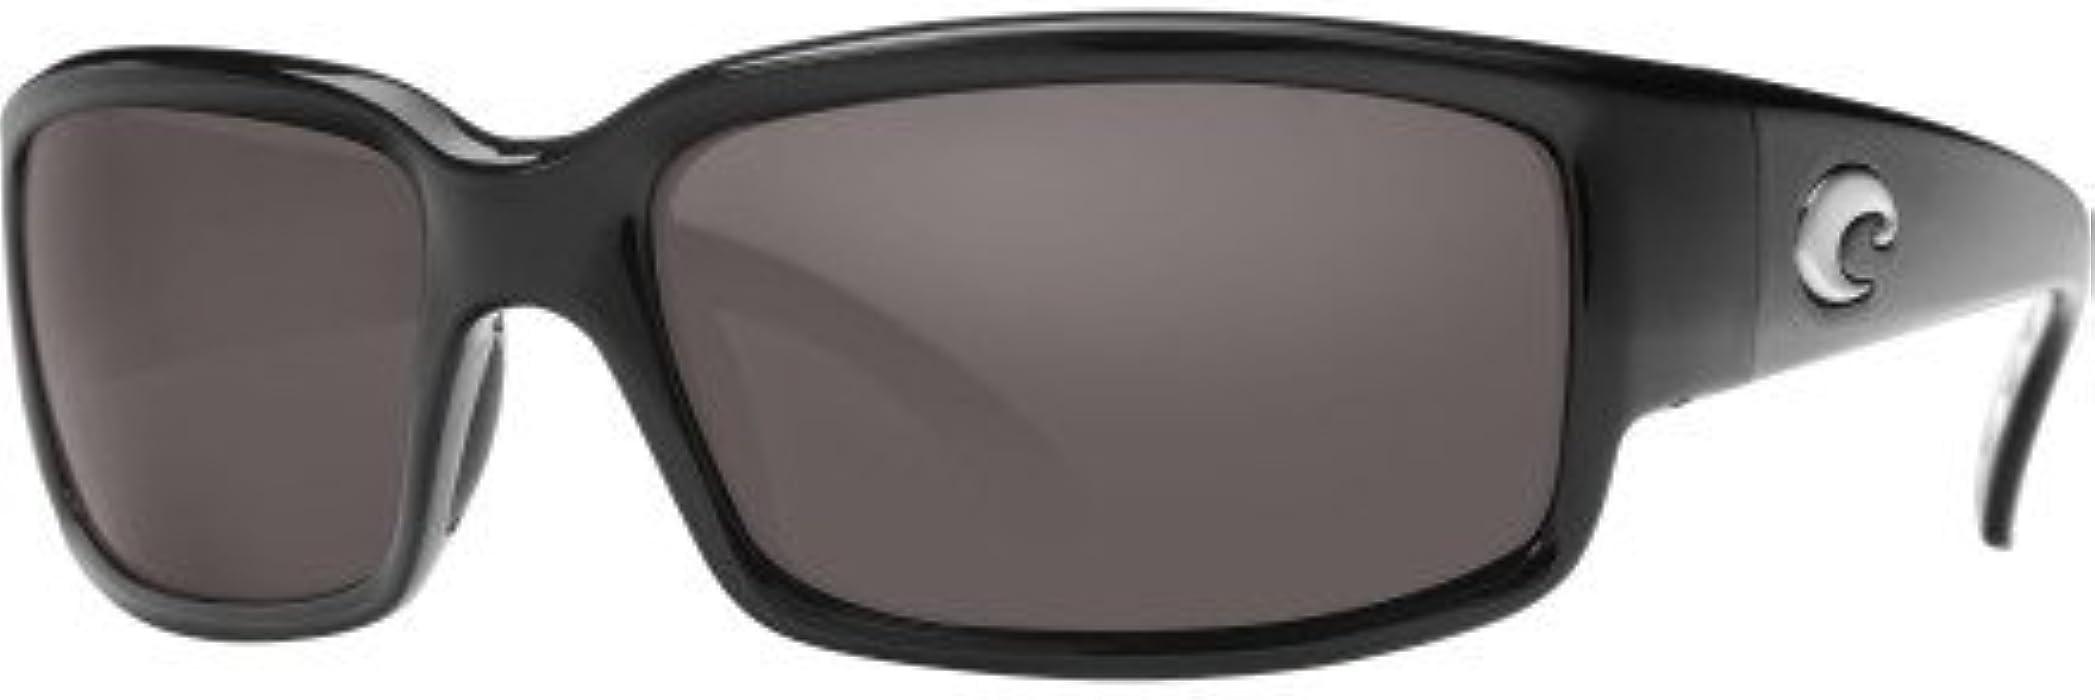 023f3a336a Costa Caballito Kenny Chesney Limited Edition Polarized Sunglasses - 400P  Polycarbonate Lens Black Gray